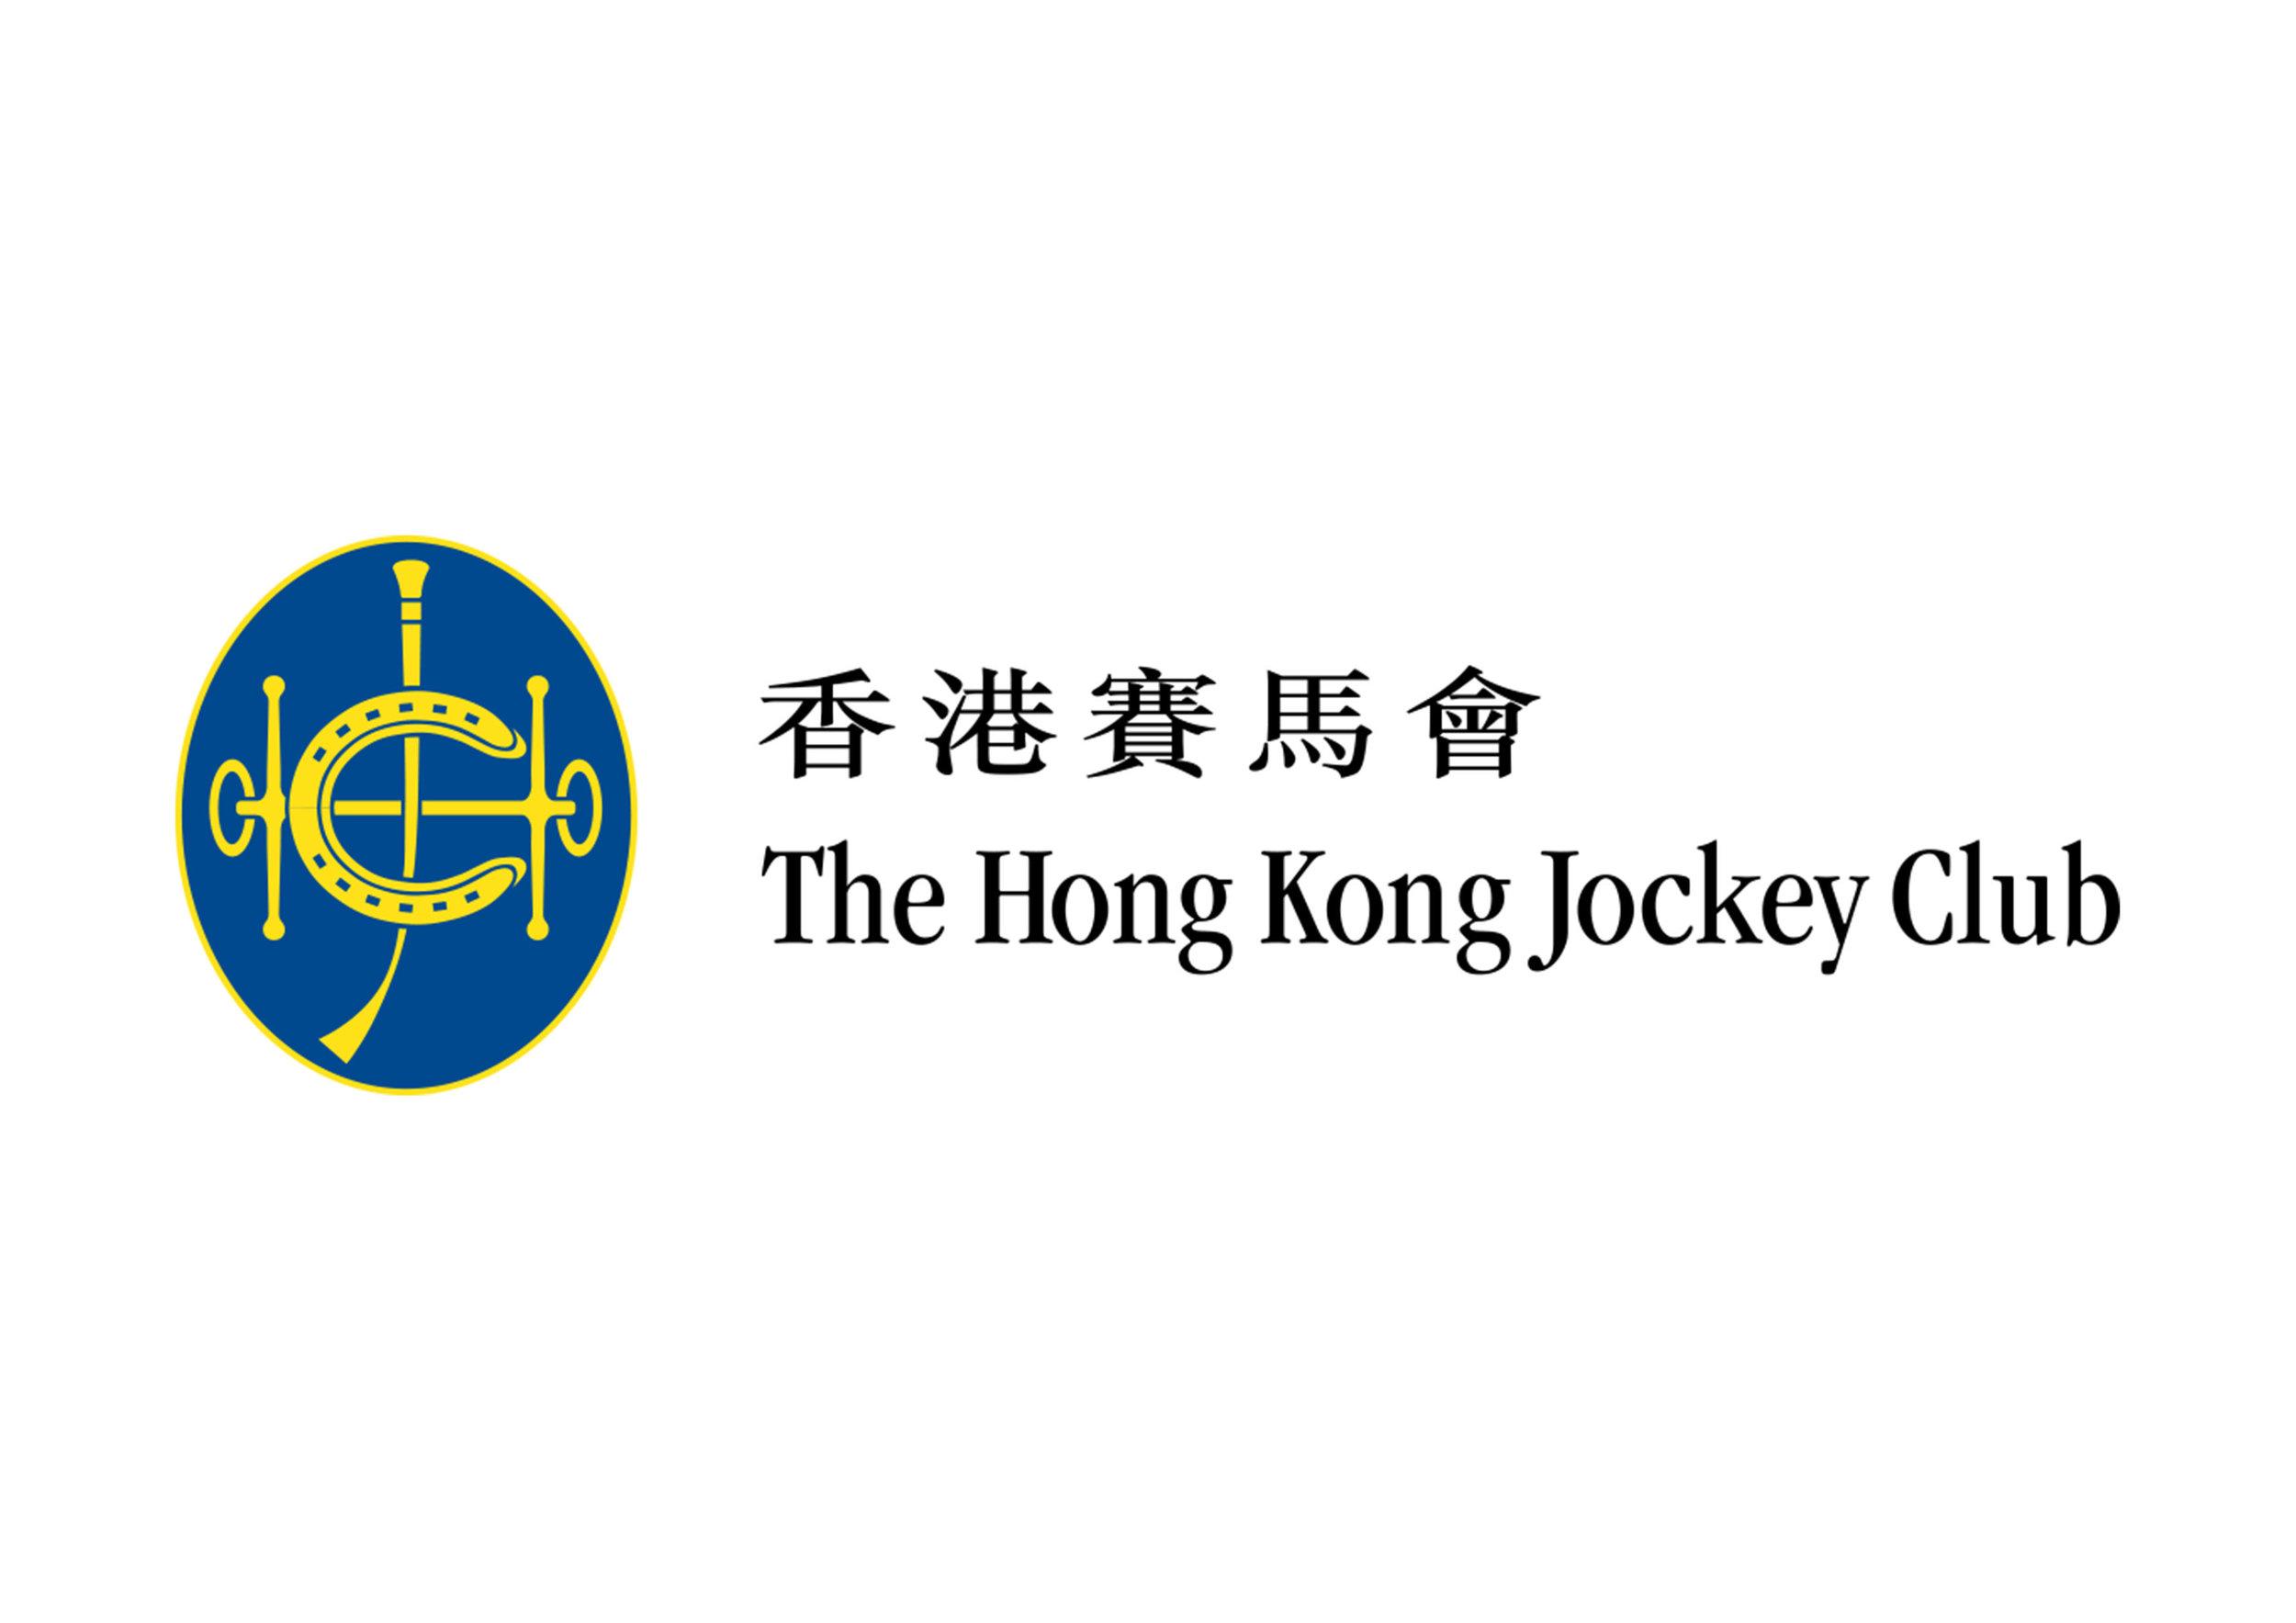 ..  The Hong Kong Jockey Club